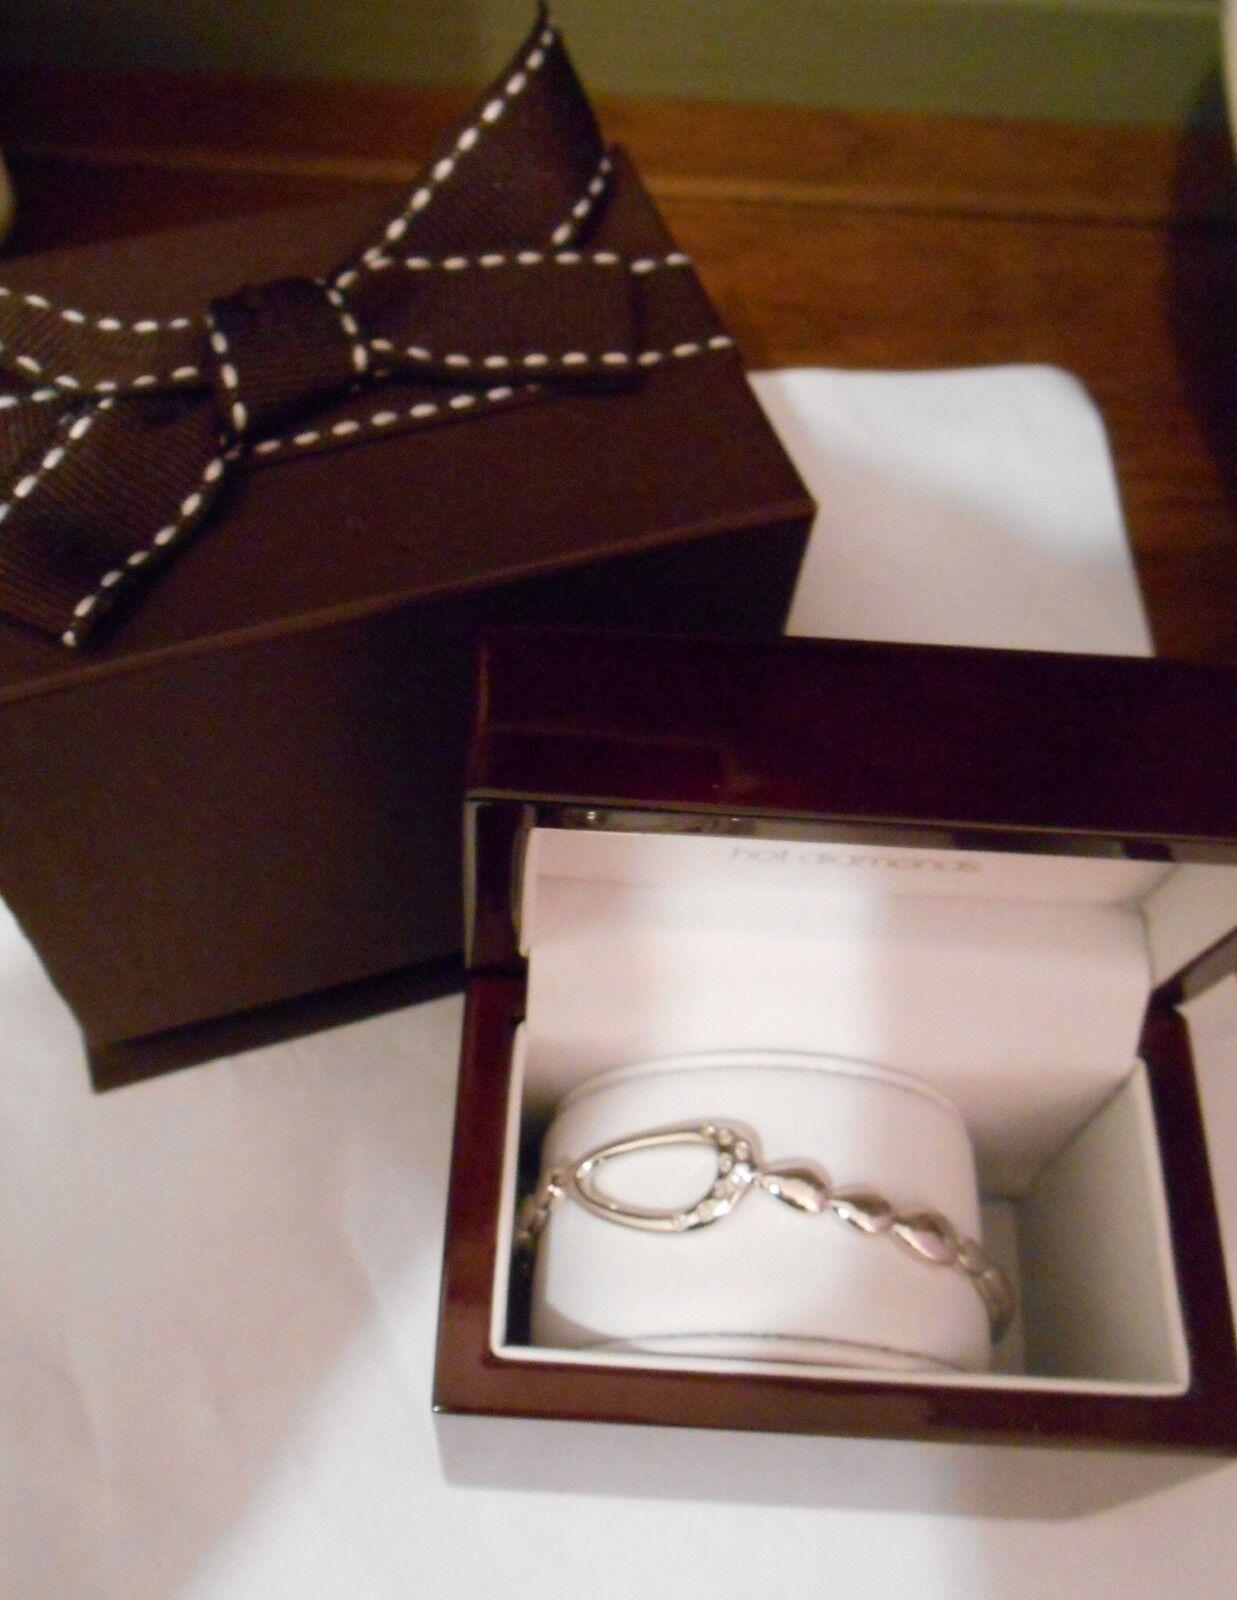 RARO Diamante Puro caldo LAGUNA Pebble Diamante Diamante Diamante braccialetto d'argentoo 2d955e